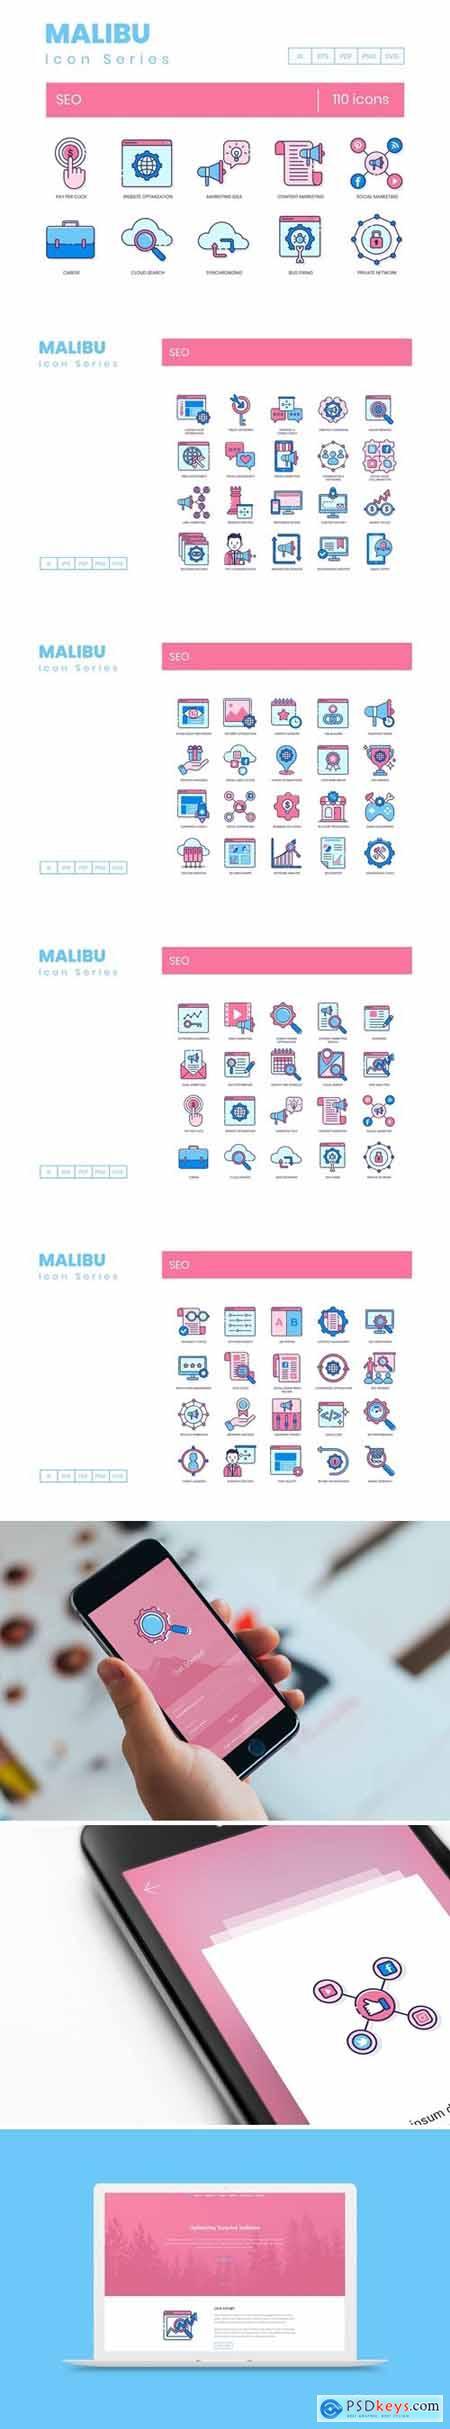 110 SEO Icons - Malibu Series